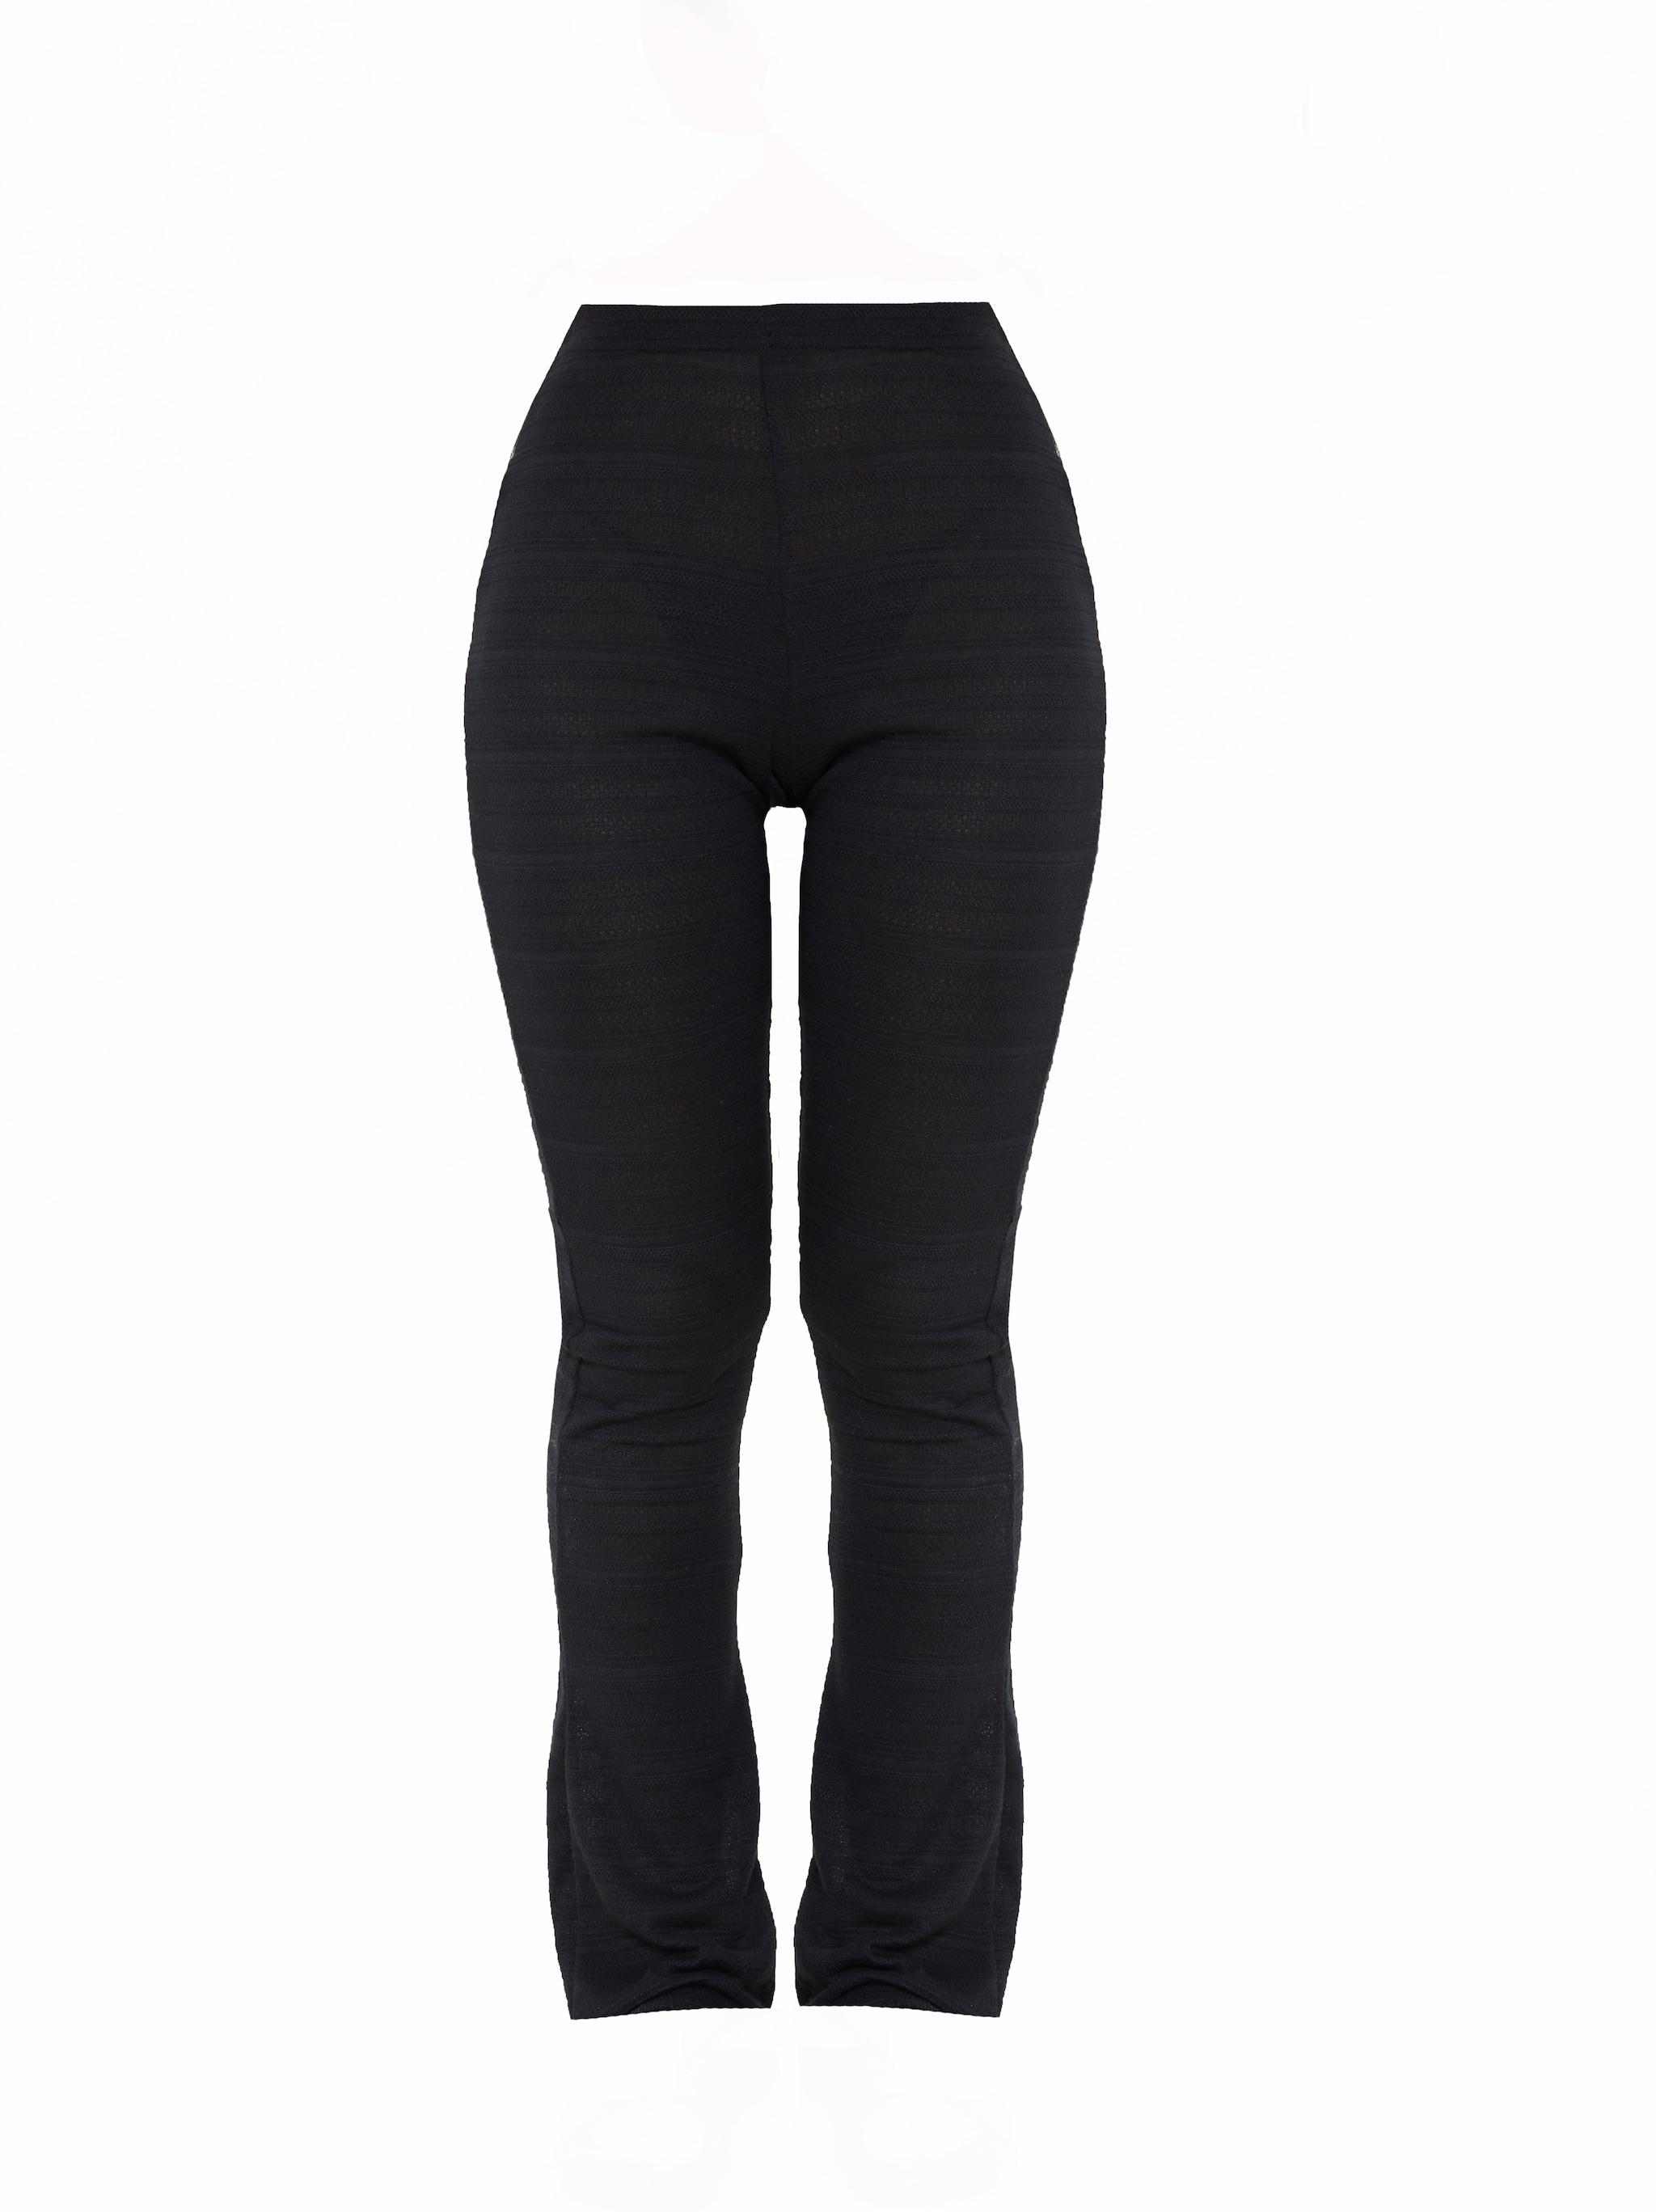 Black Textured Skinny Flared Pants 5